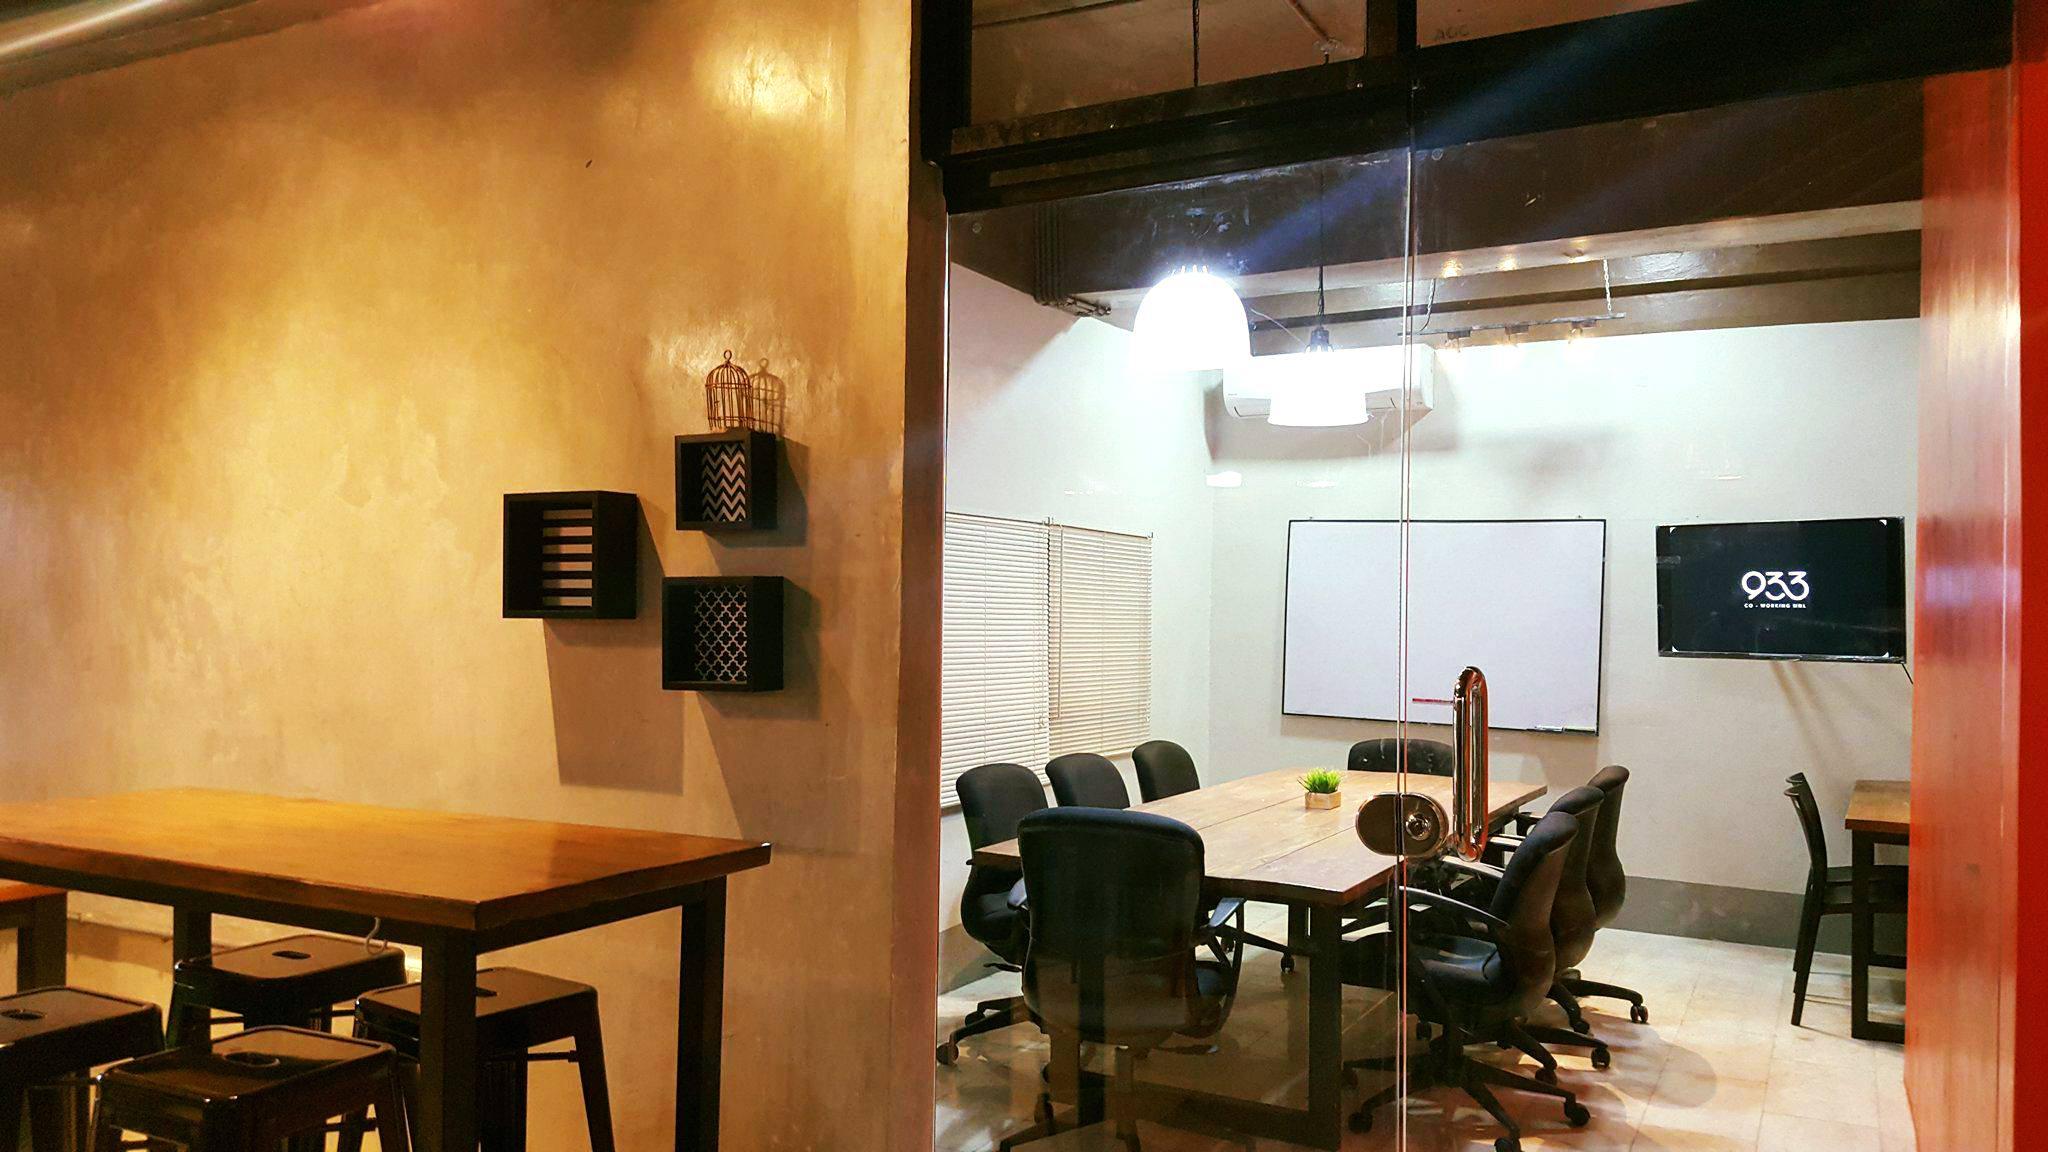 933 Coworking MNL, Manila